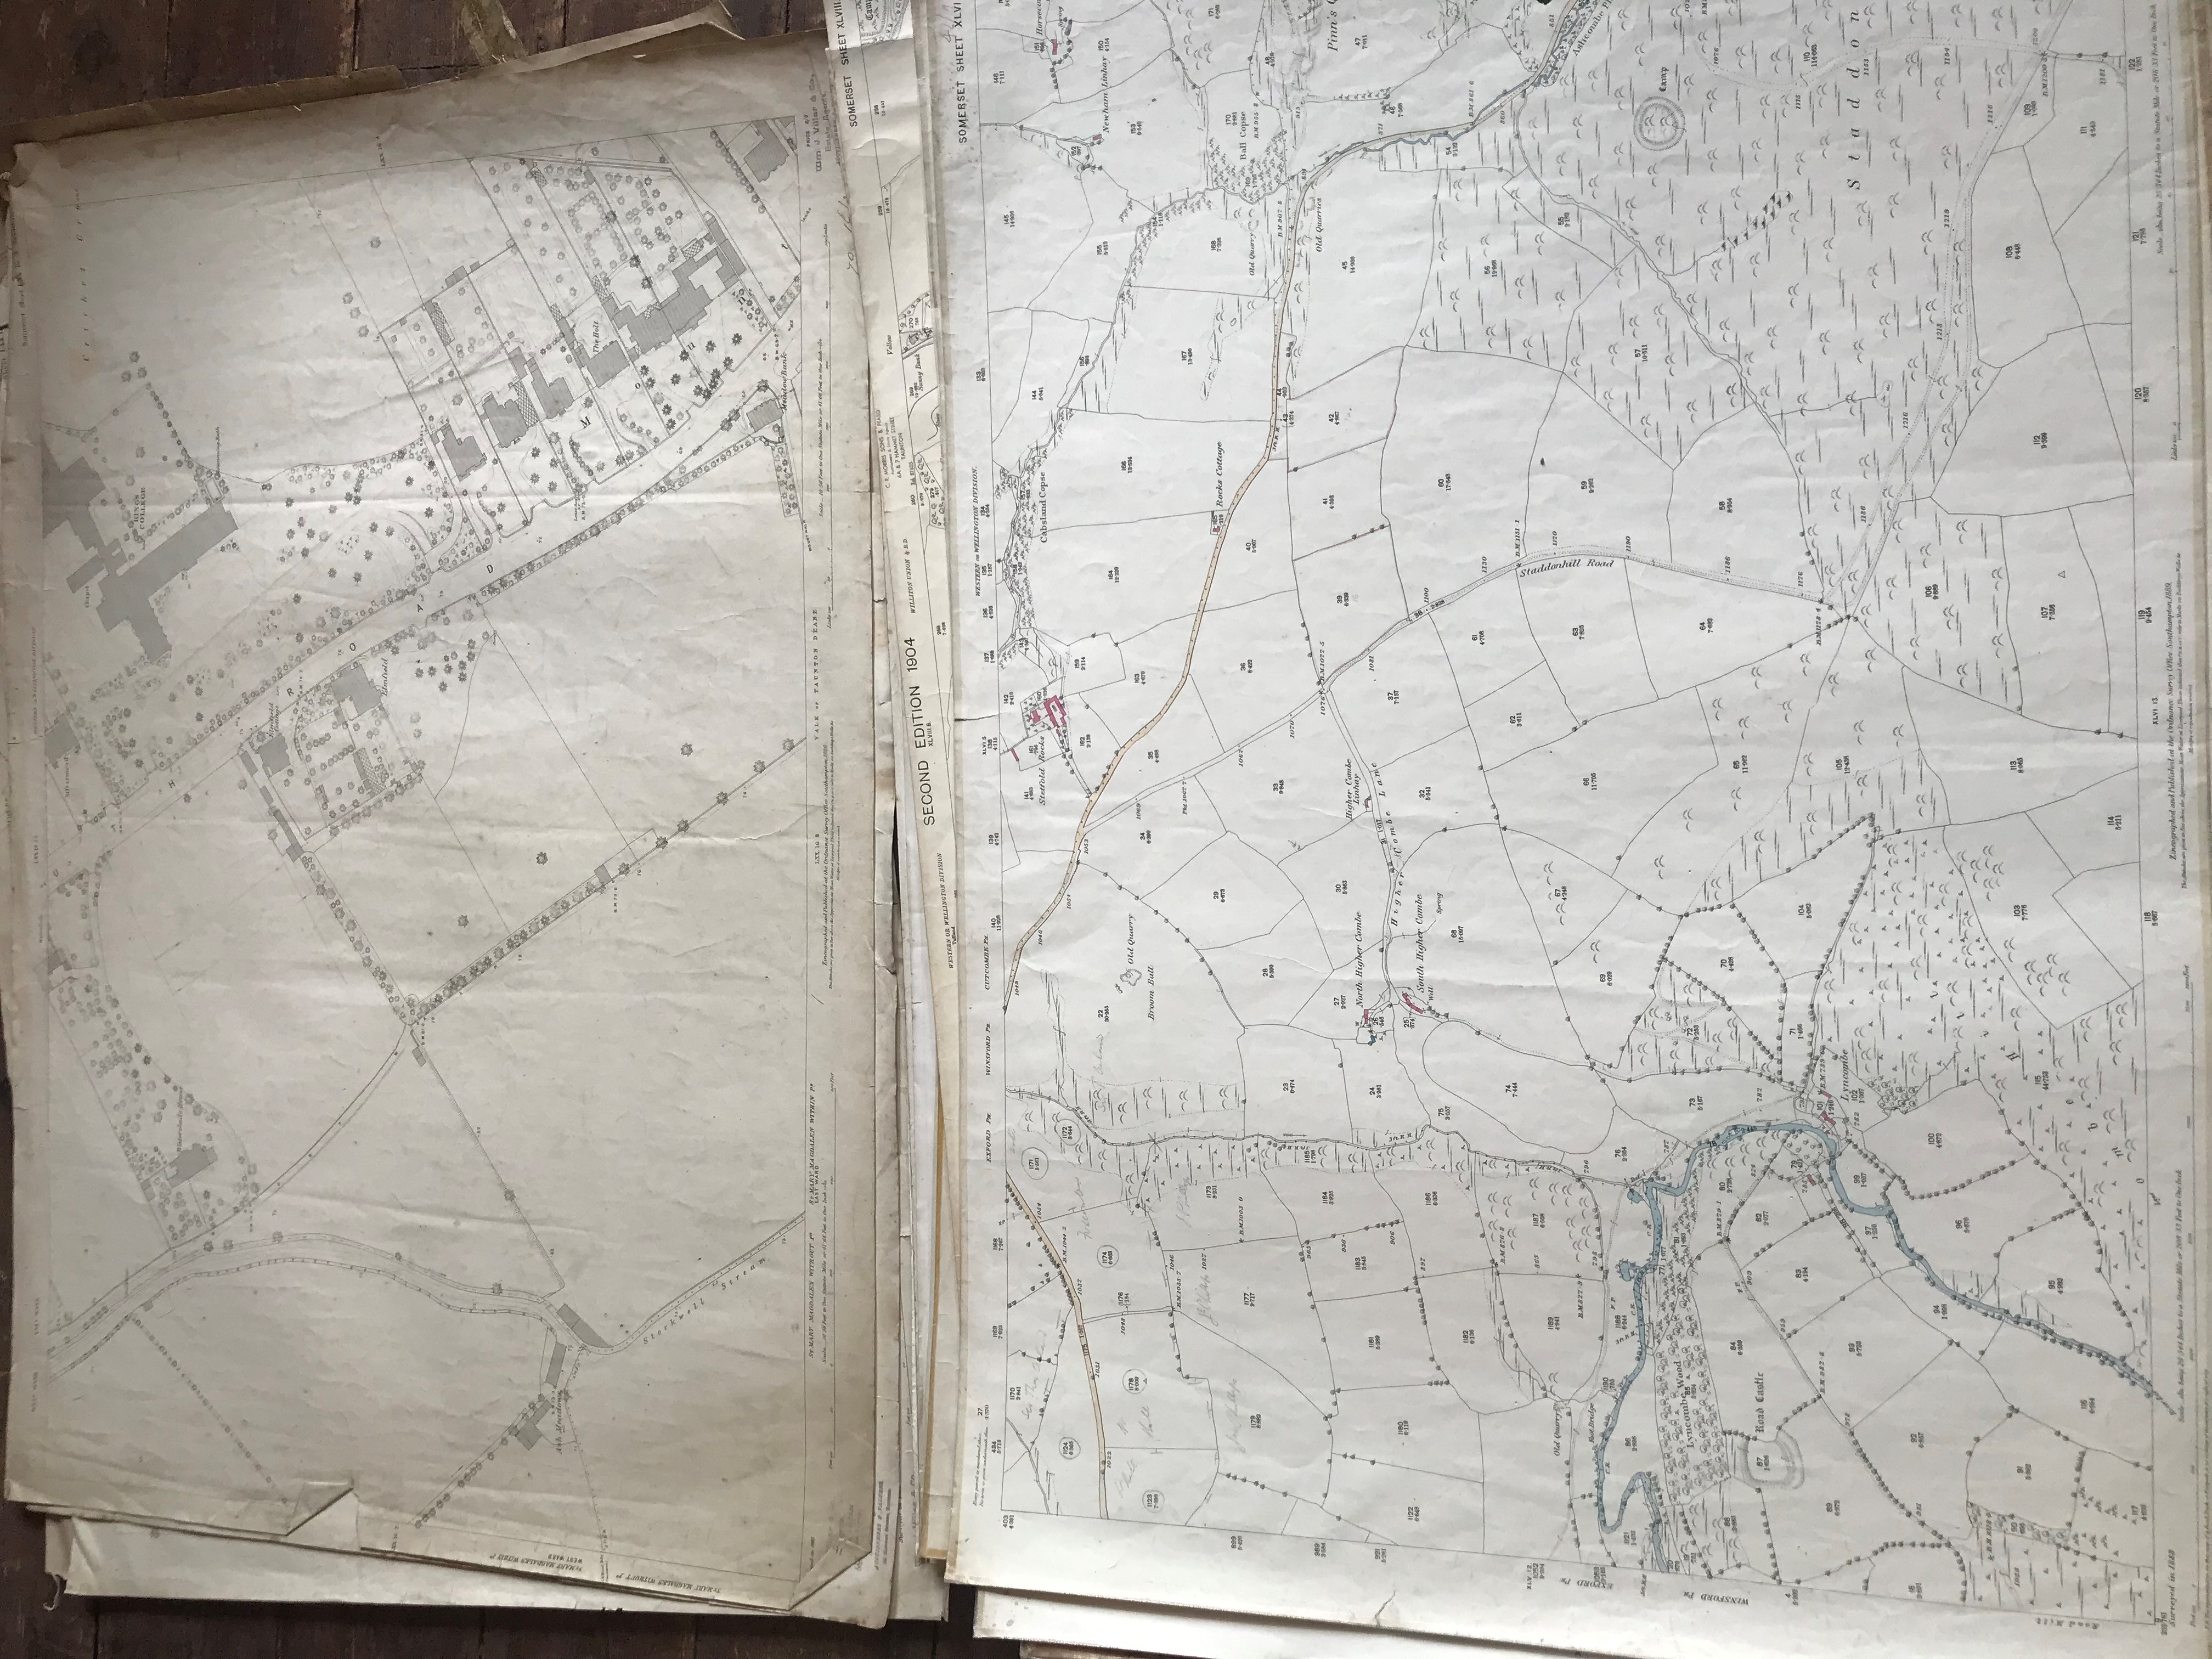 THIRTY 1:2500 ORDNANCE SURVEY MAPS featuring Chelston, Ham, Sampford Brett, Wellington, - Image 7 of 16